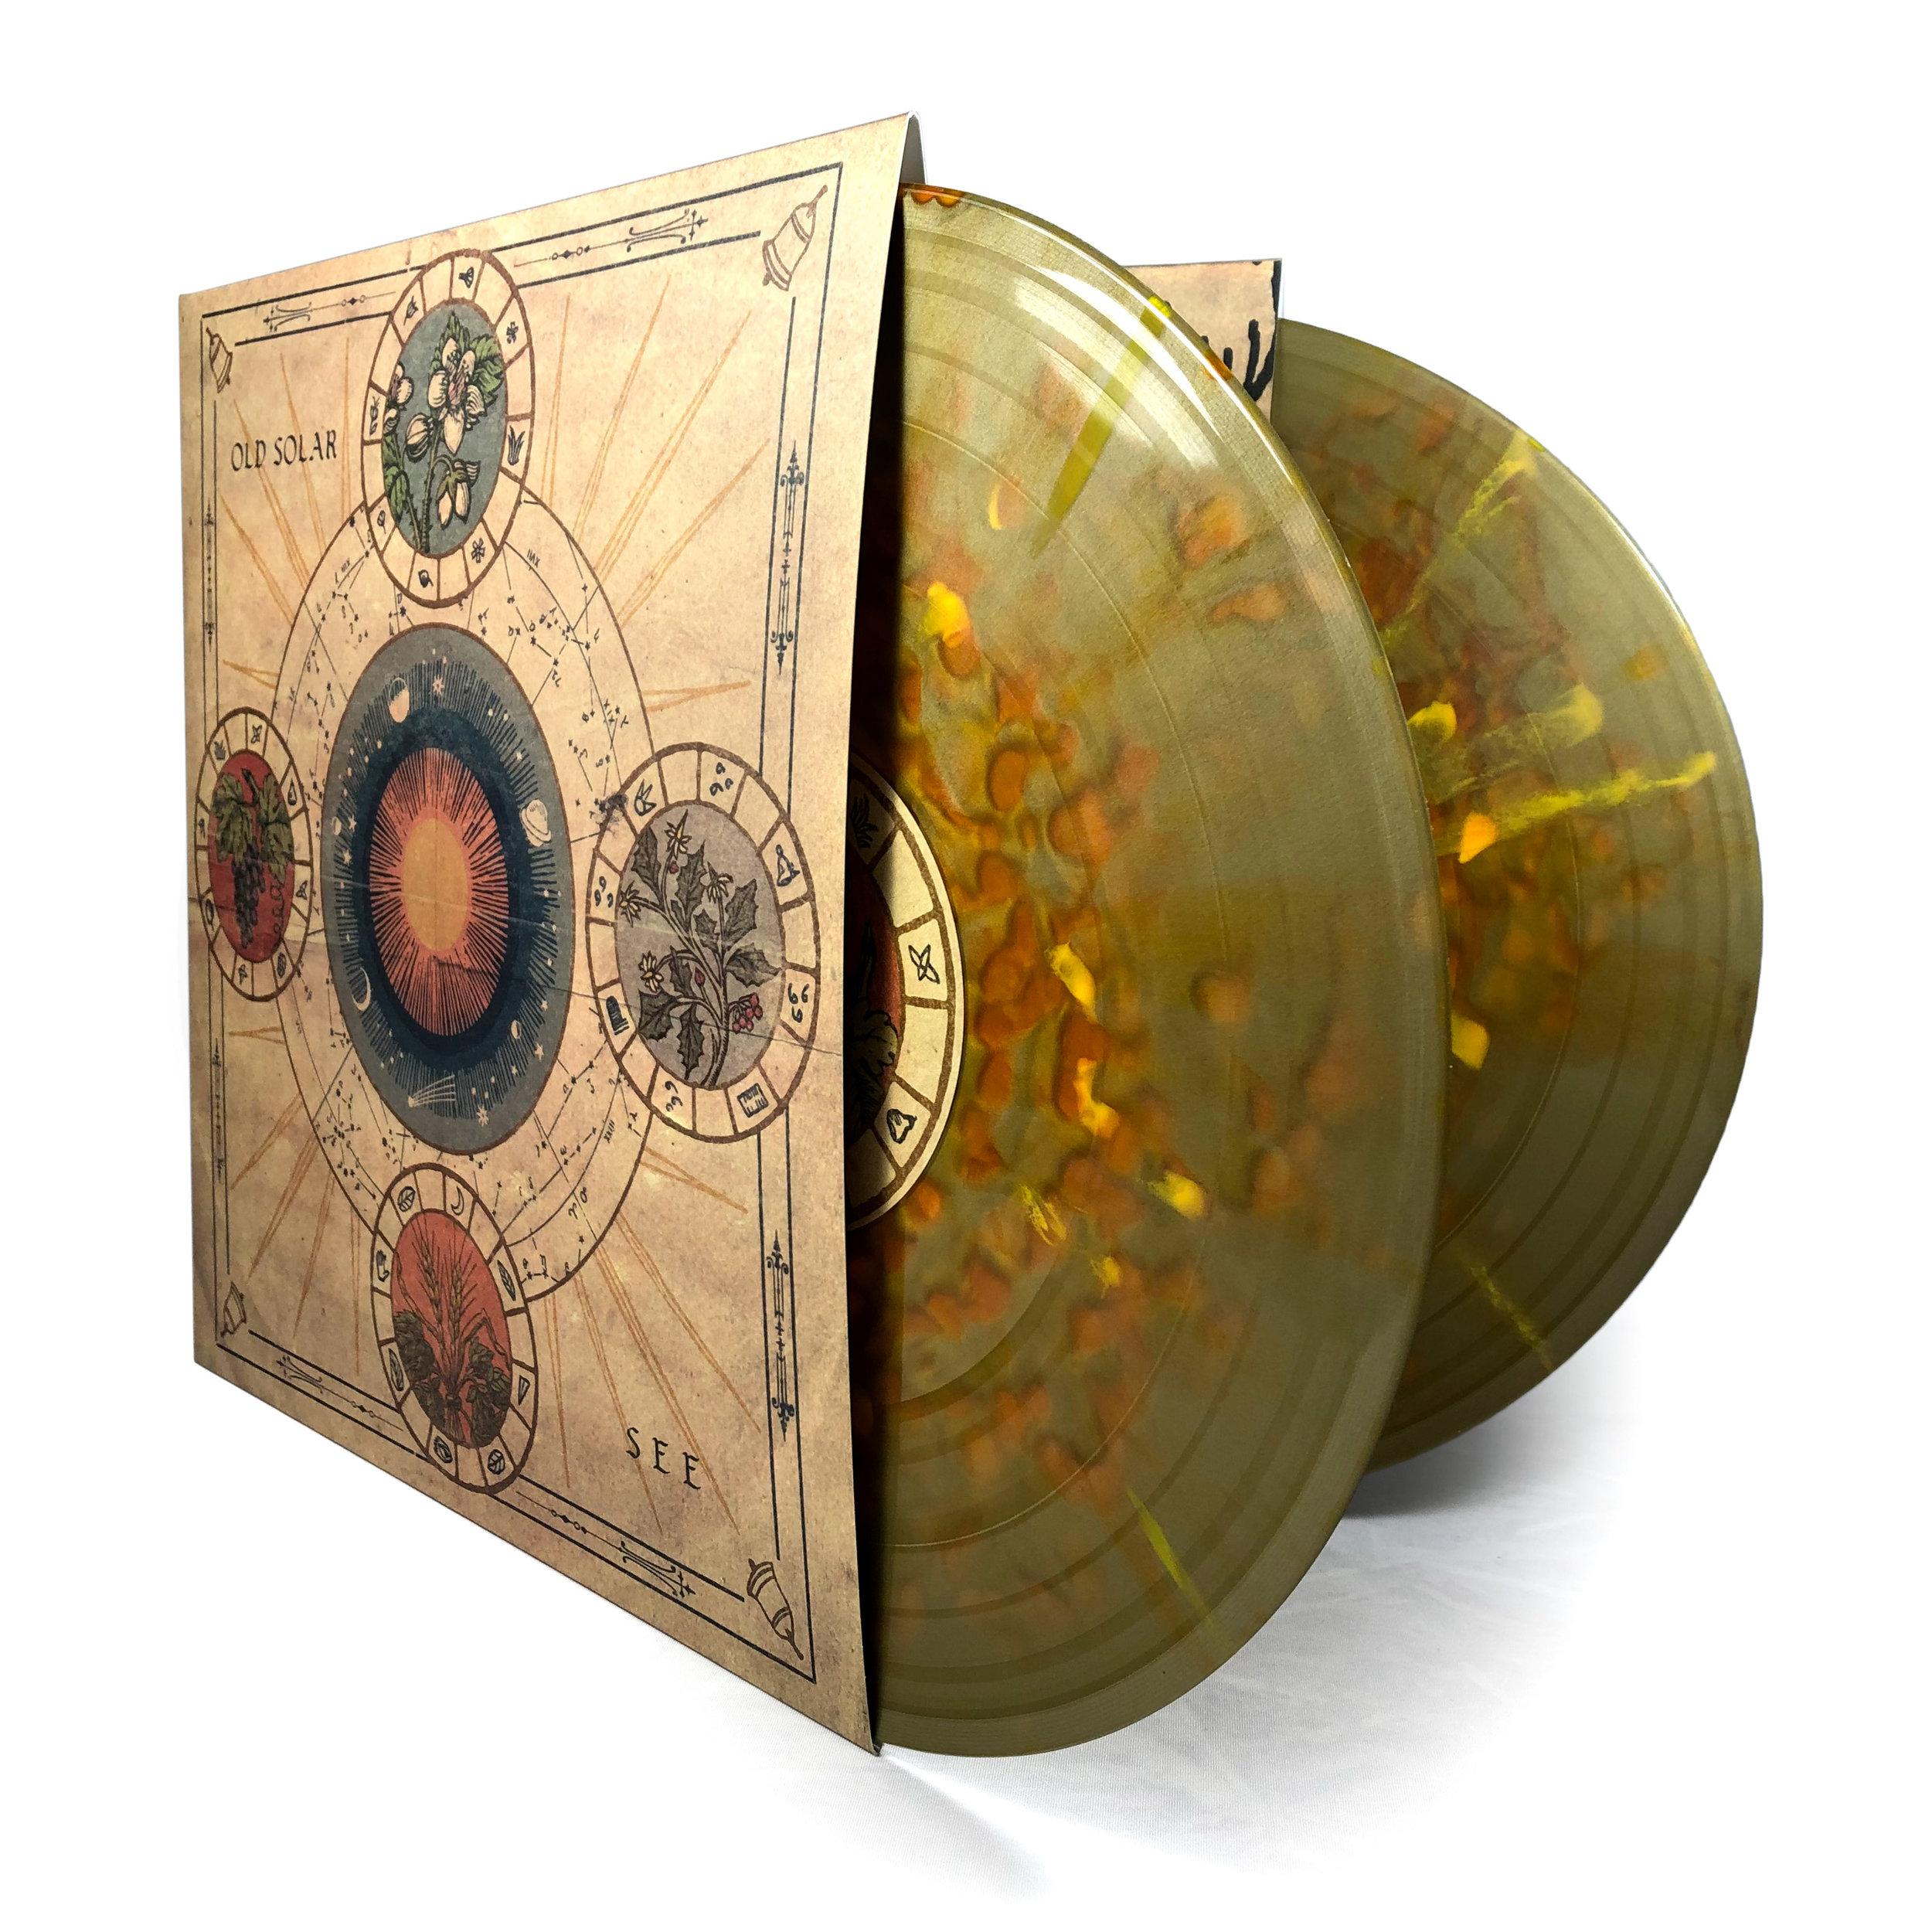 Old Solar • SEE [2xLP] - dunk!records (EU) variant